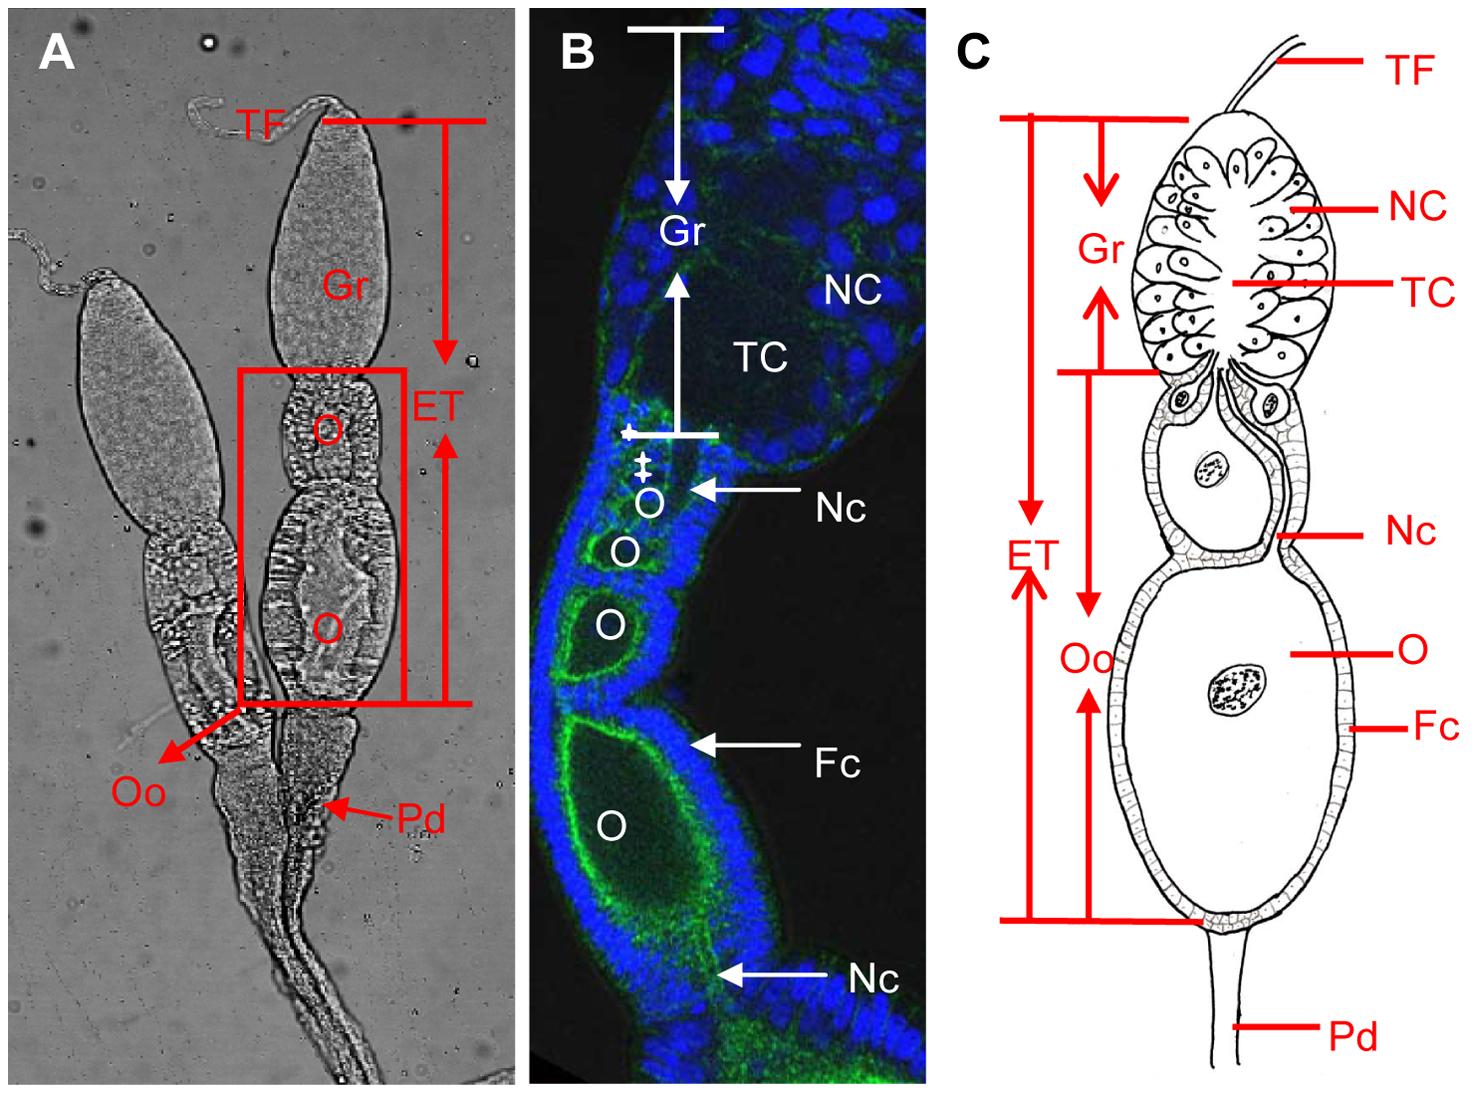 Ovary structure of <i>Laodelphax striatellus</i>.